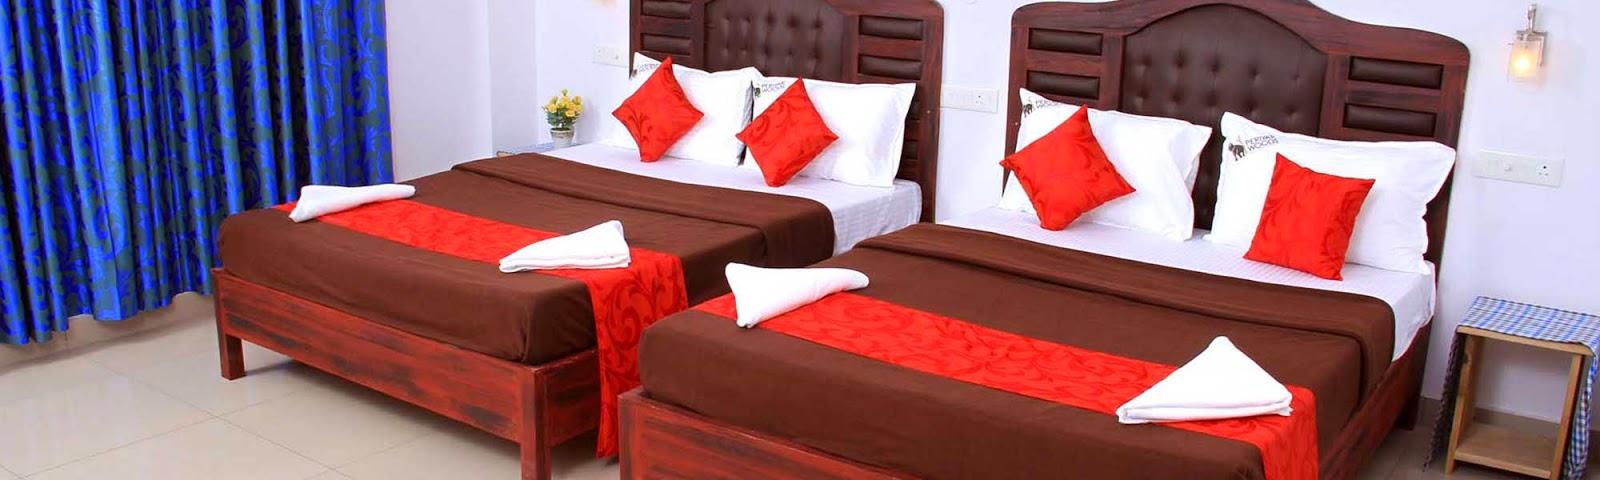 thekkady hotels rates, budget family resort in thekkady